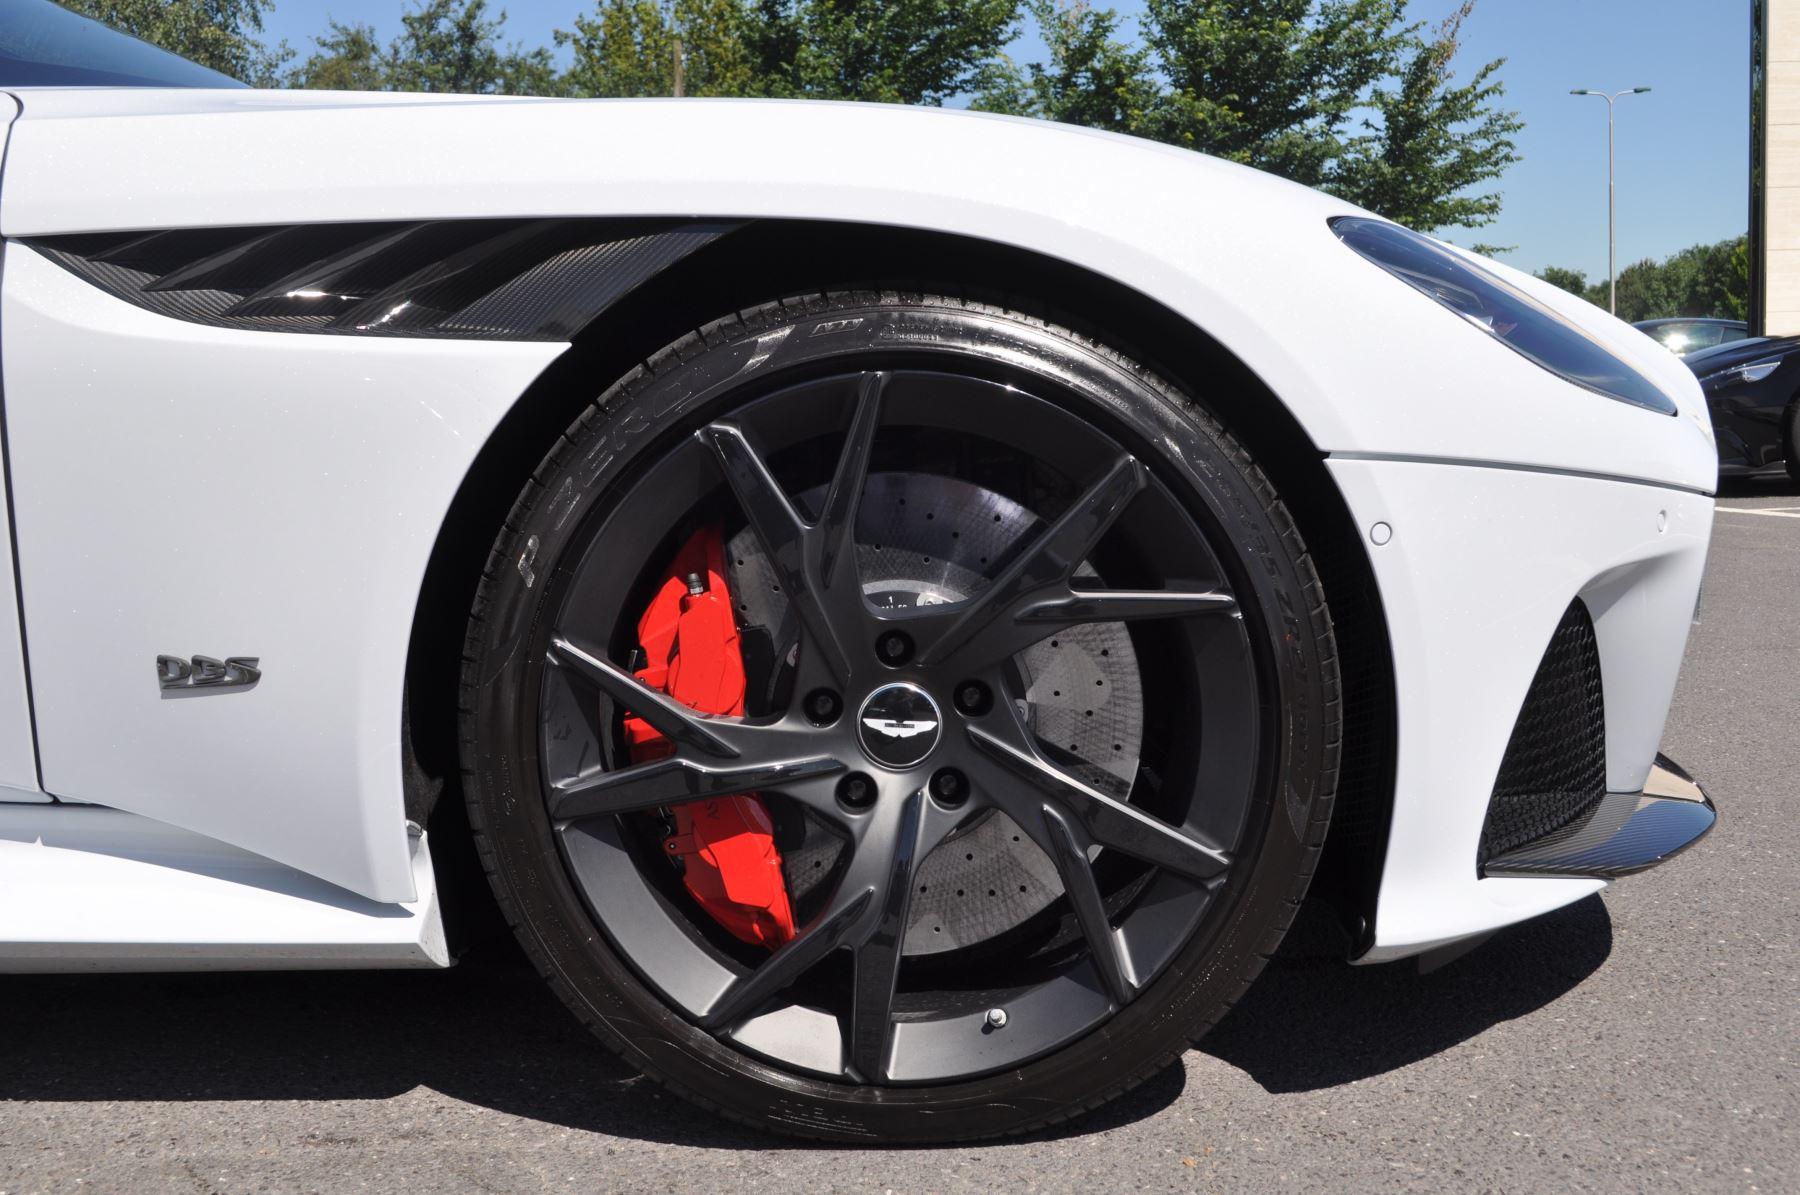 Aston Martin DBS V12 Superleggera 2dr Touchtronic image 42